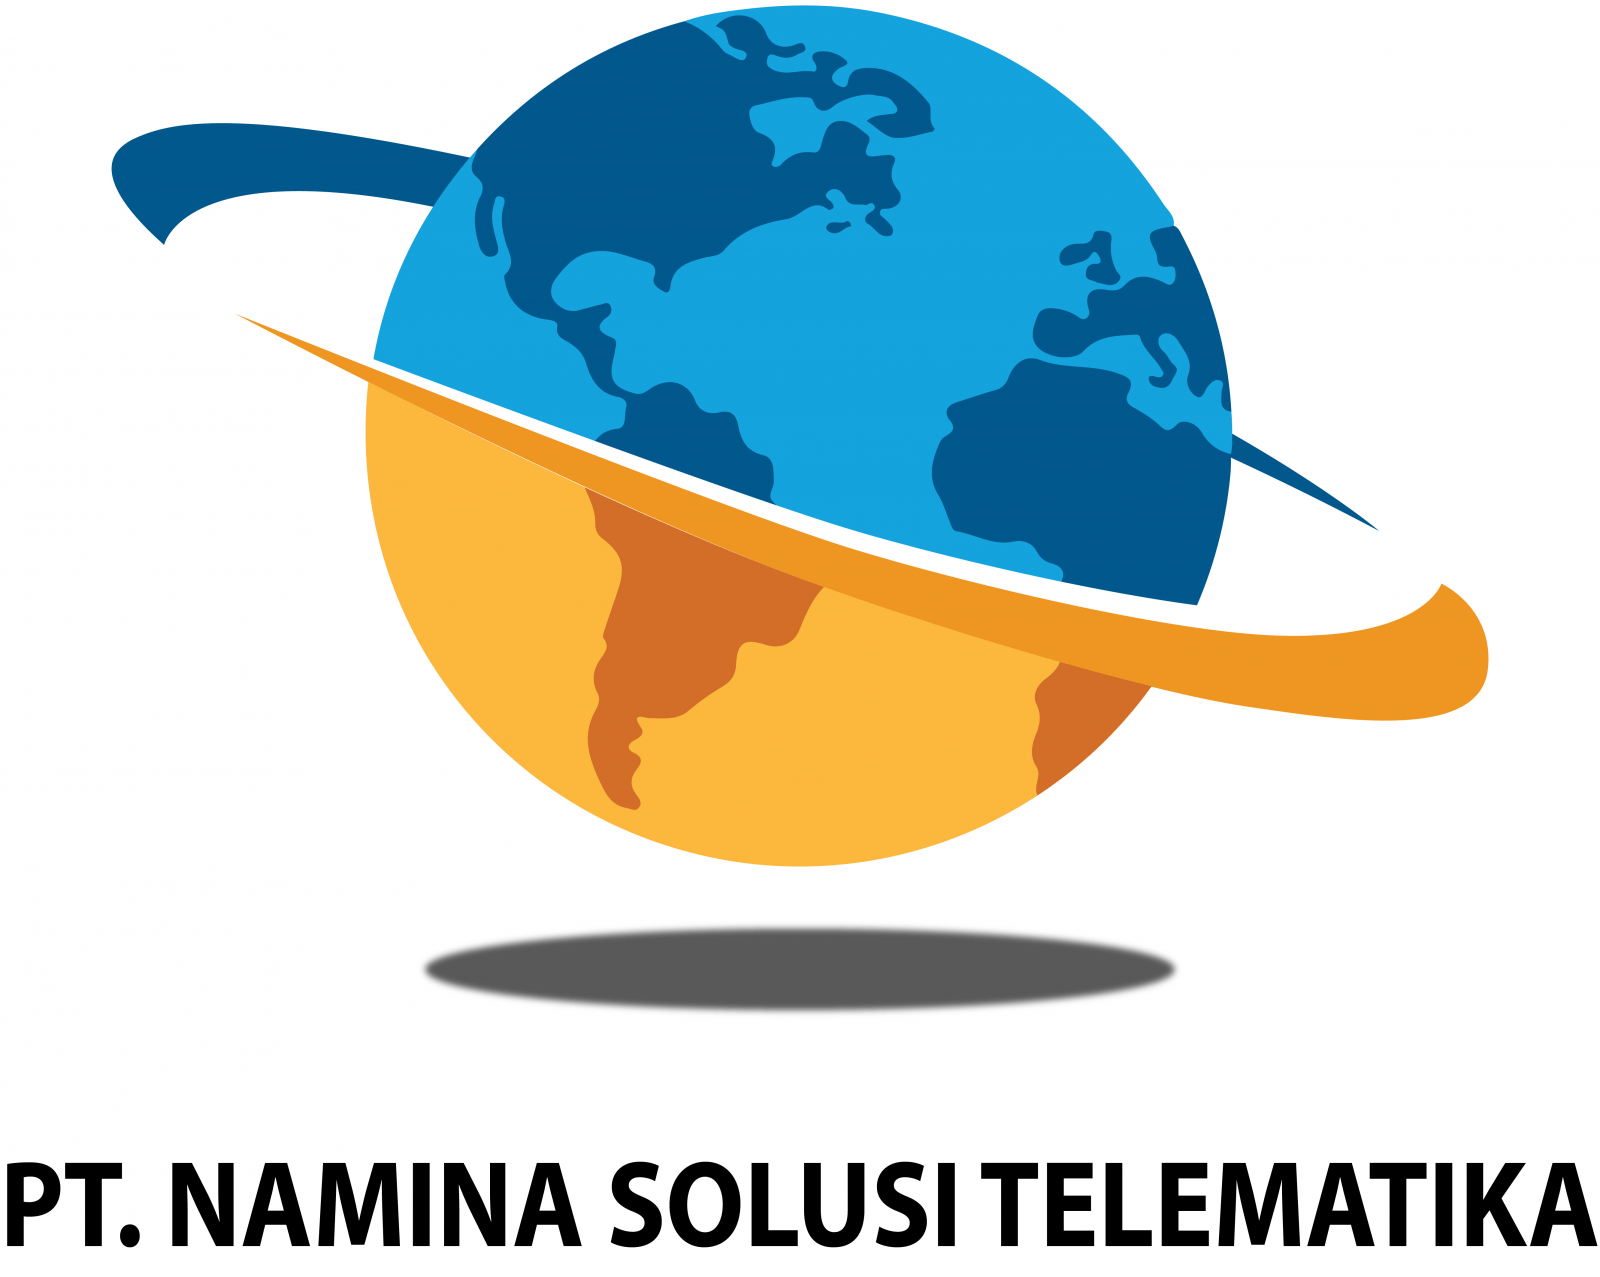 PT Namina Solusi Telematika